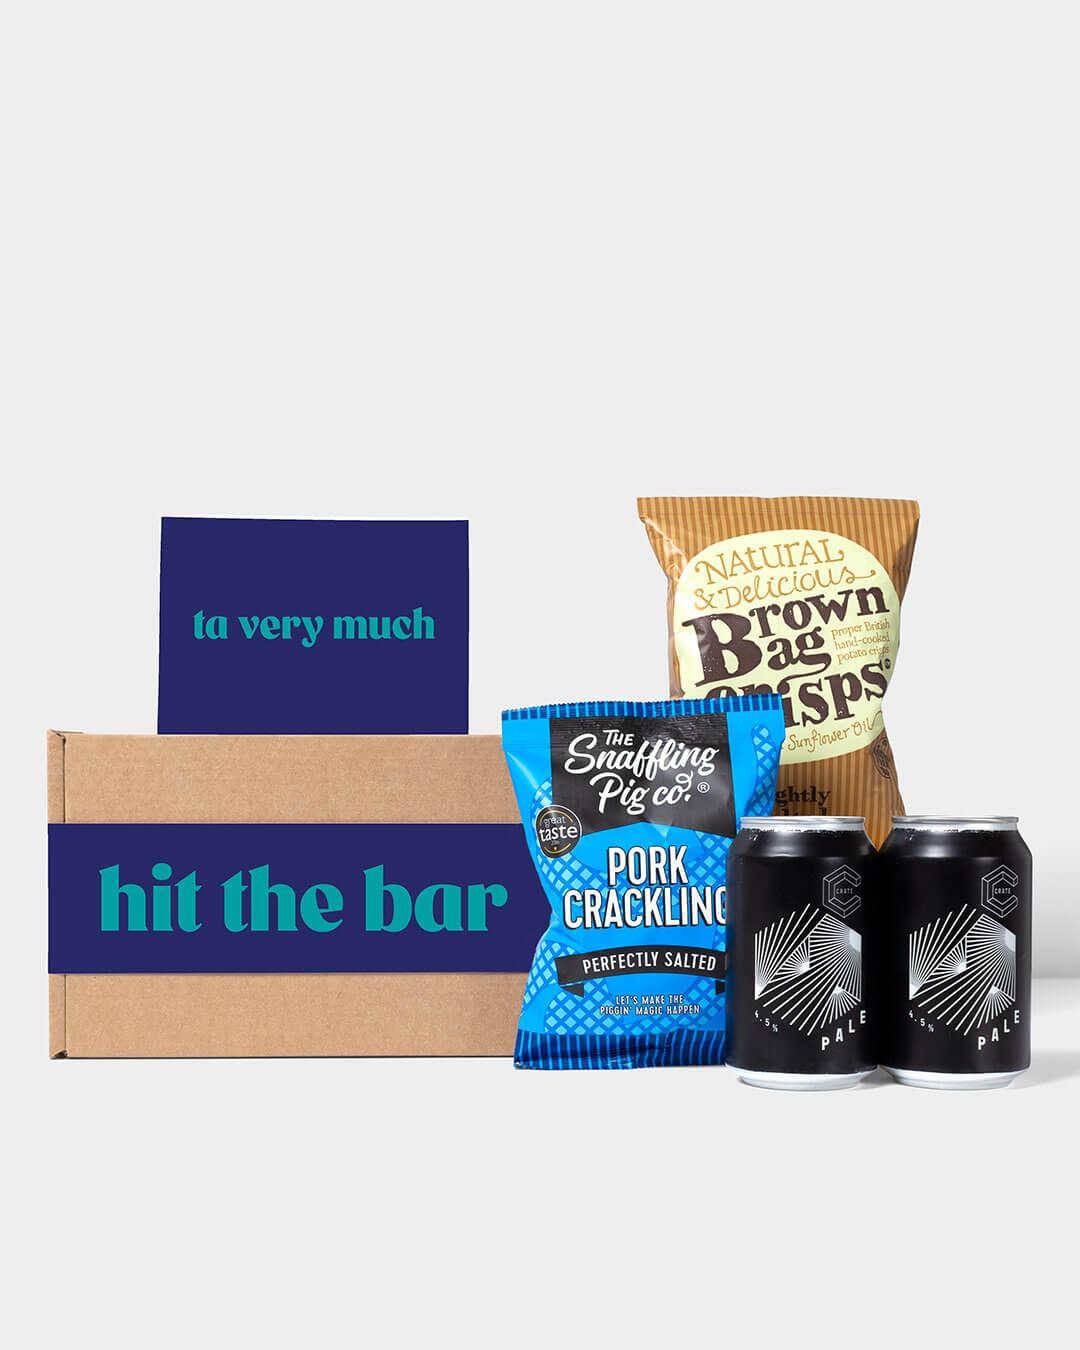 Craft beer box including contents: Crate Brewery Beer, Snaffling Pig Pork Scratchings & brown Bag Crisps